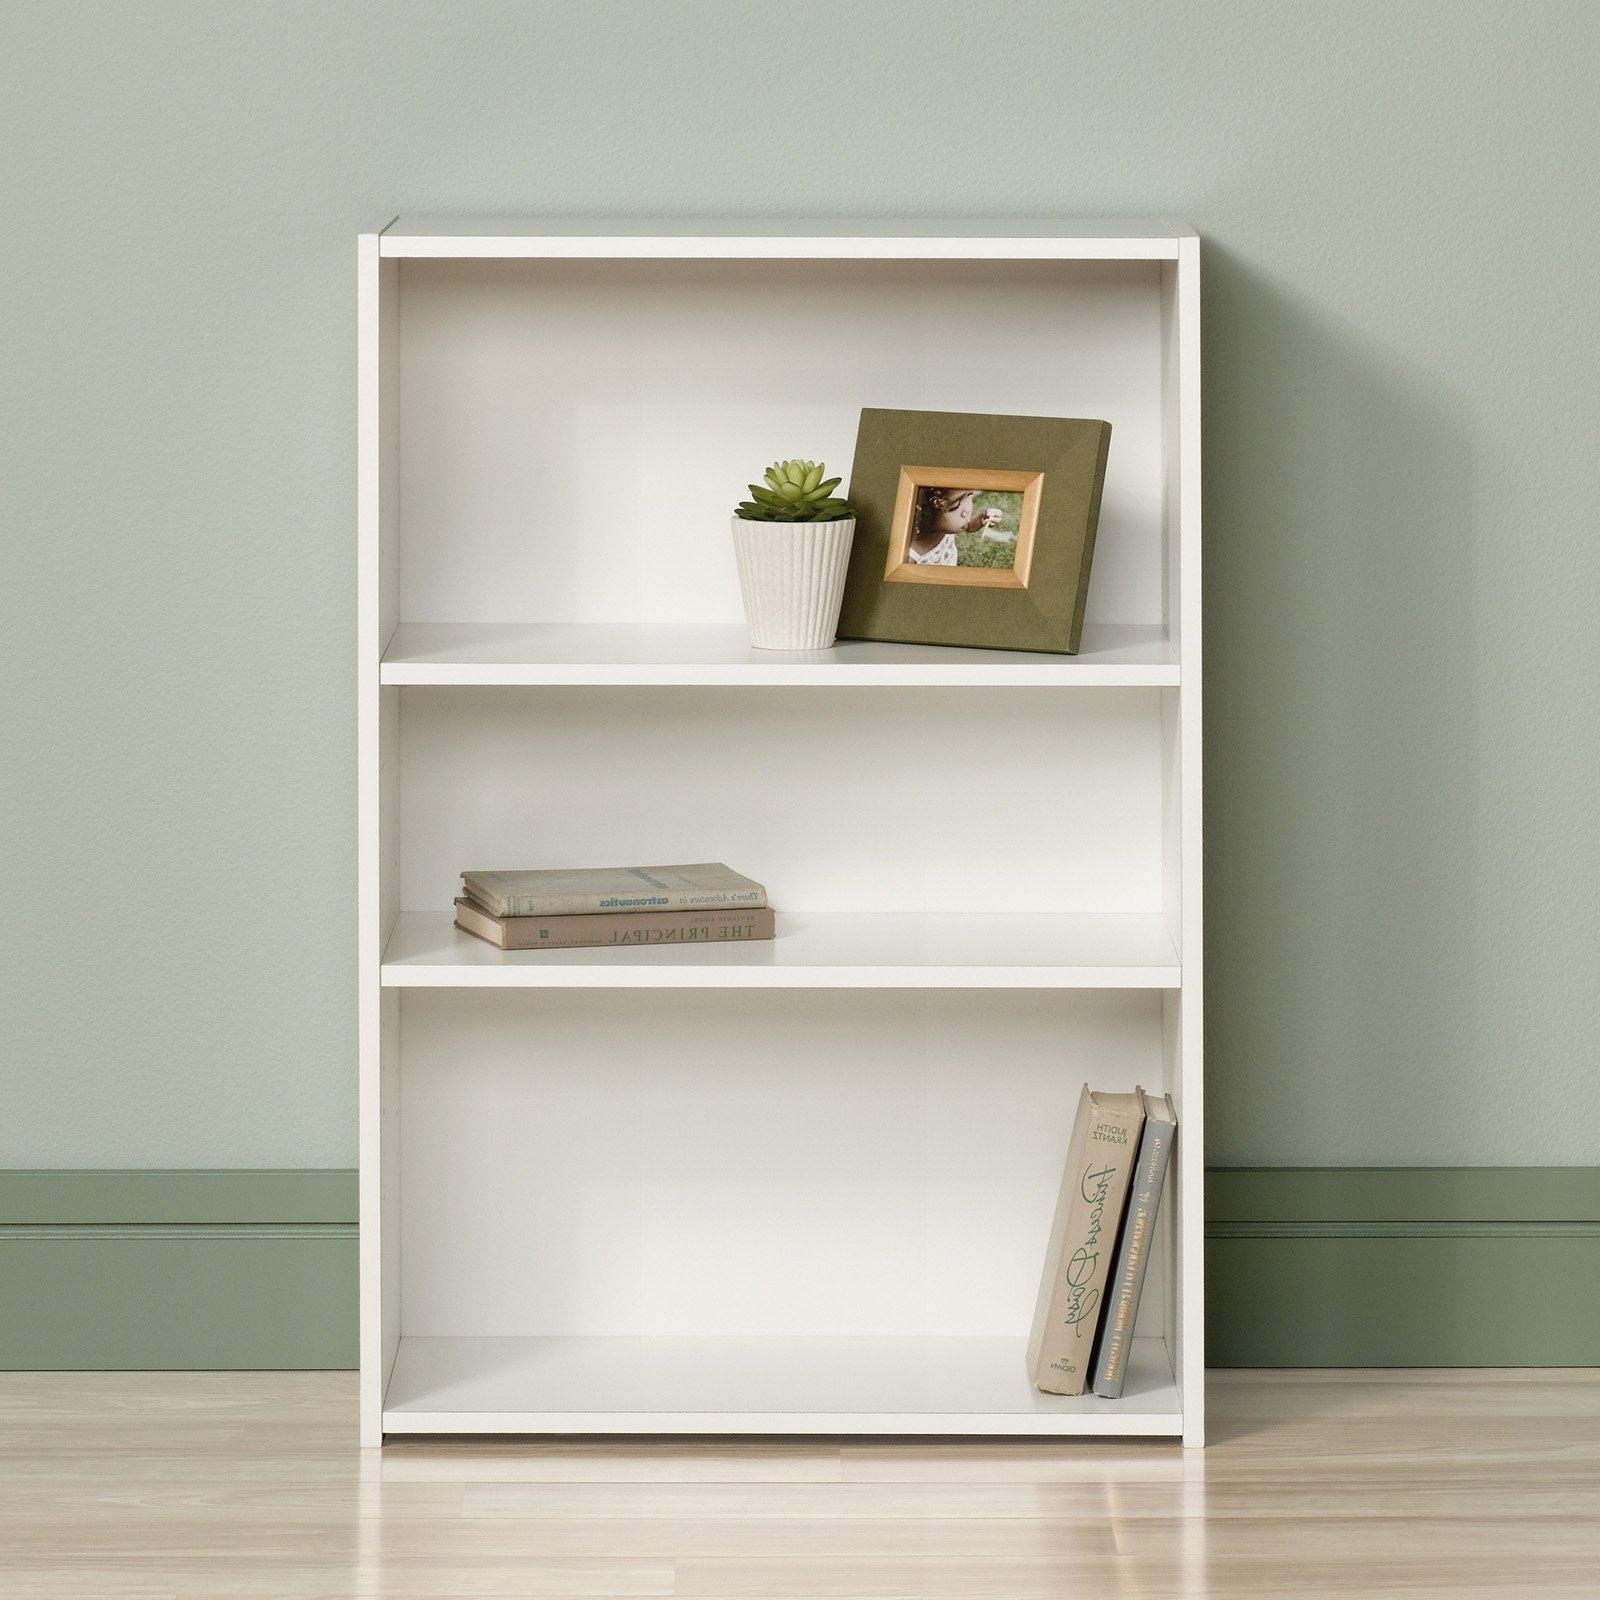 Most Recent Sauder Beginnings 3 Shelf Bookcase, Multiple Finishes – Walmart Intended For Sauder Beginnings 3 Shelf Bookcases (View 3 of 15)